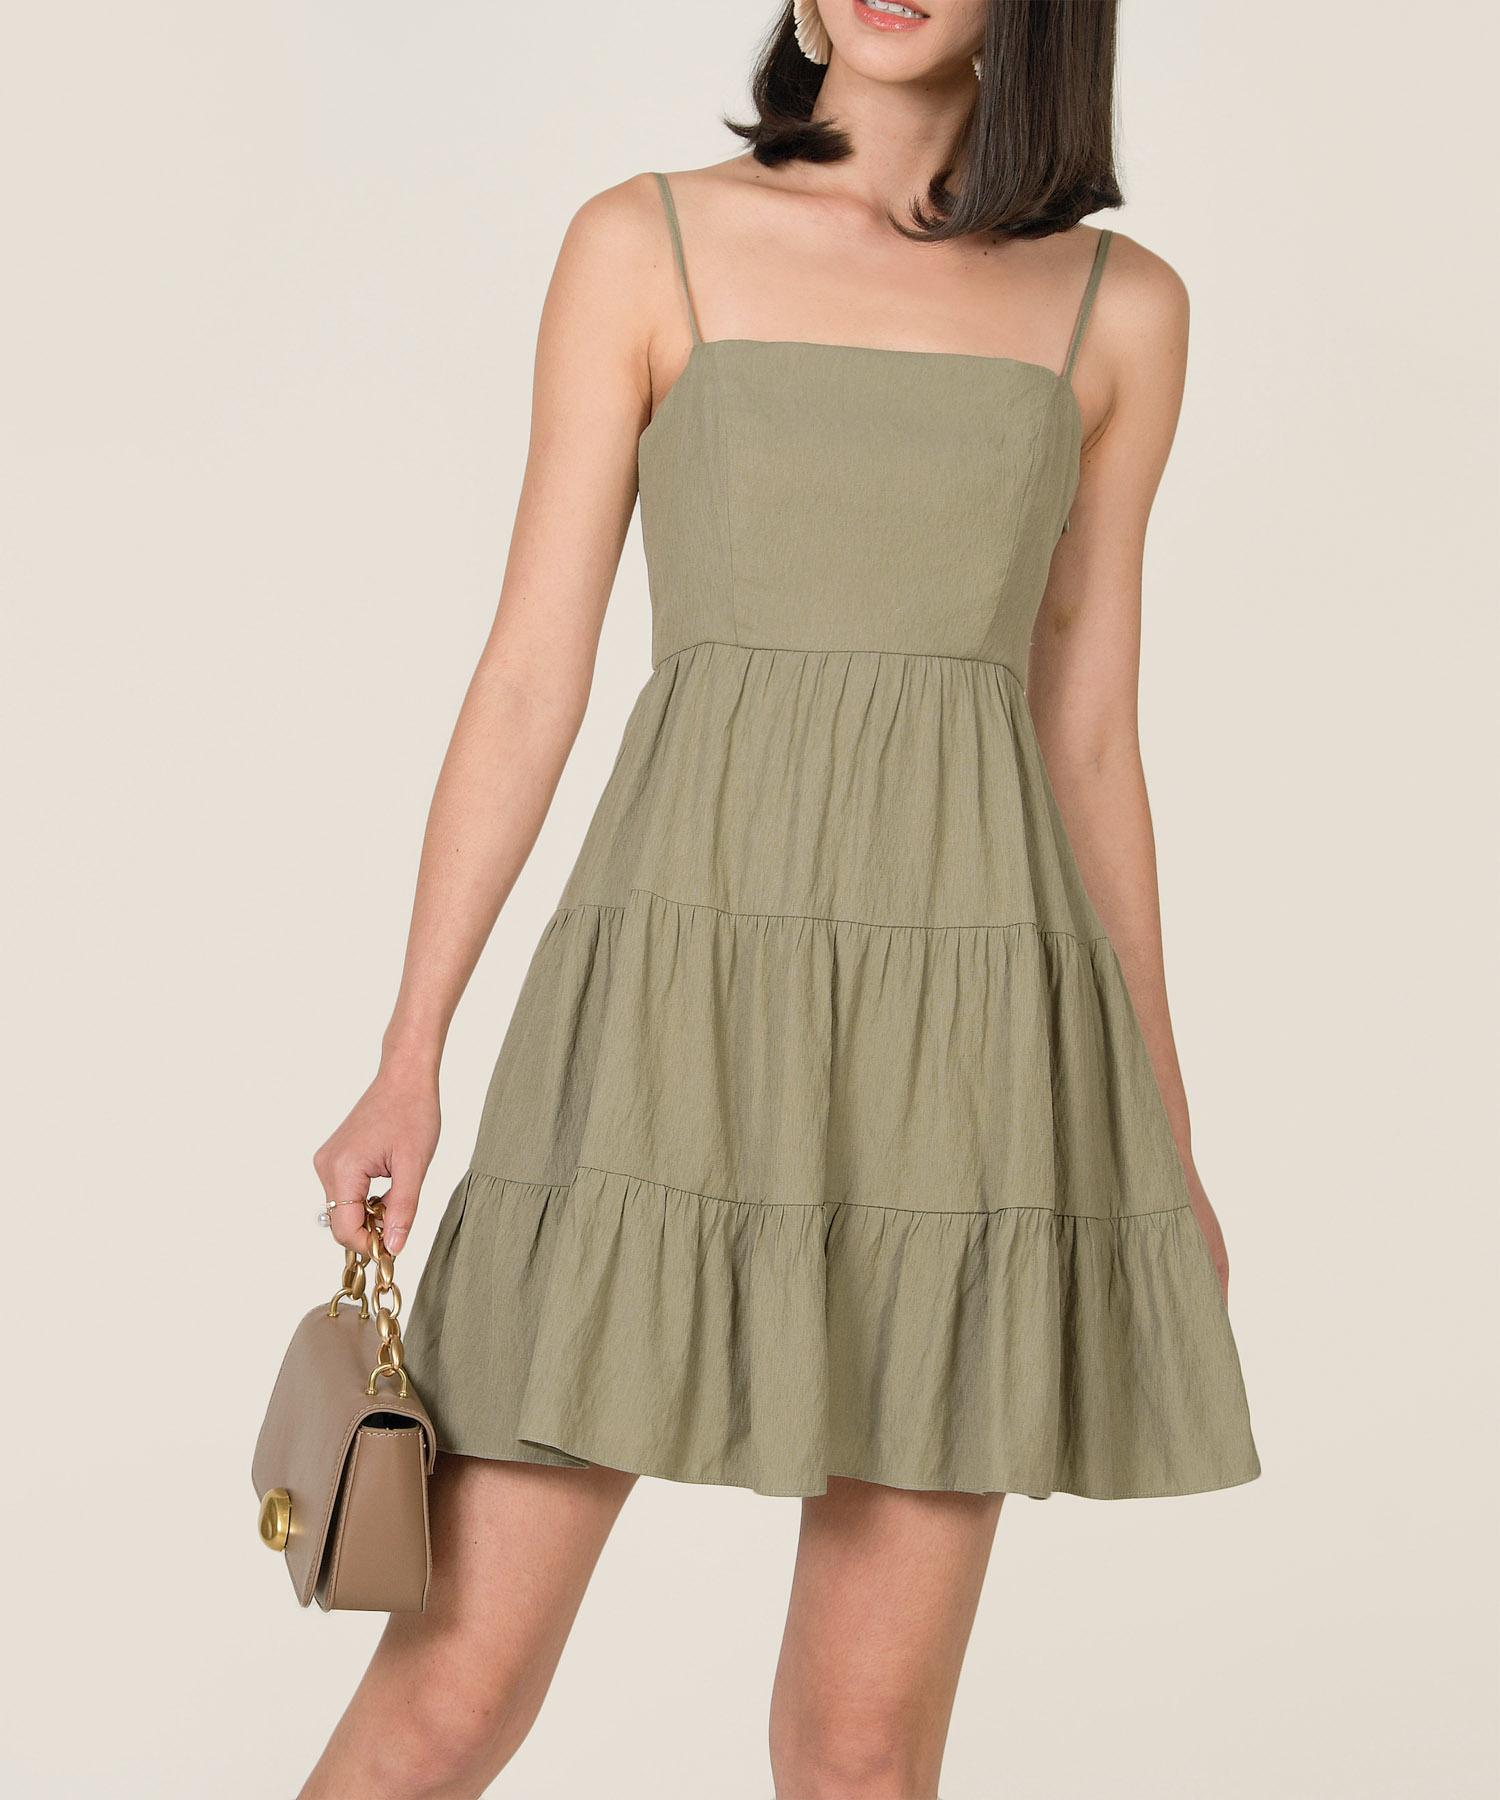 castella-linen-tiered-dress-pale-olive-1